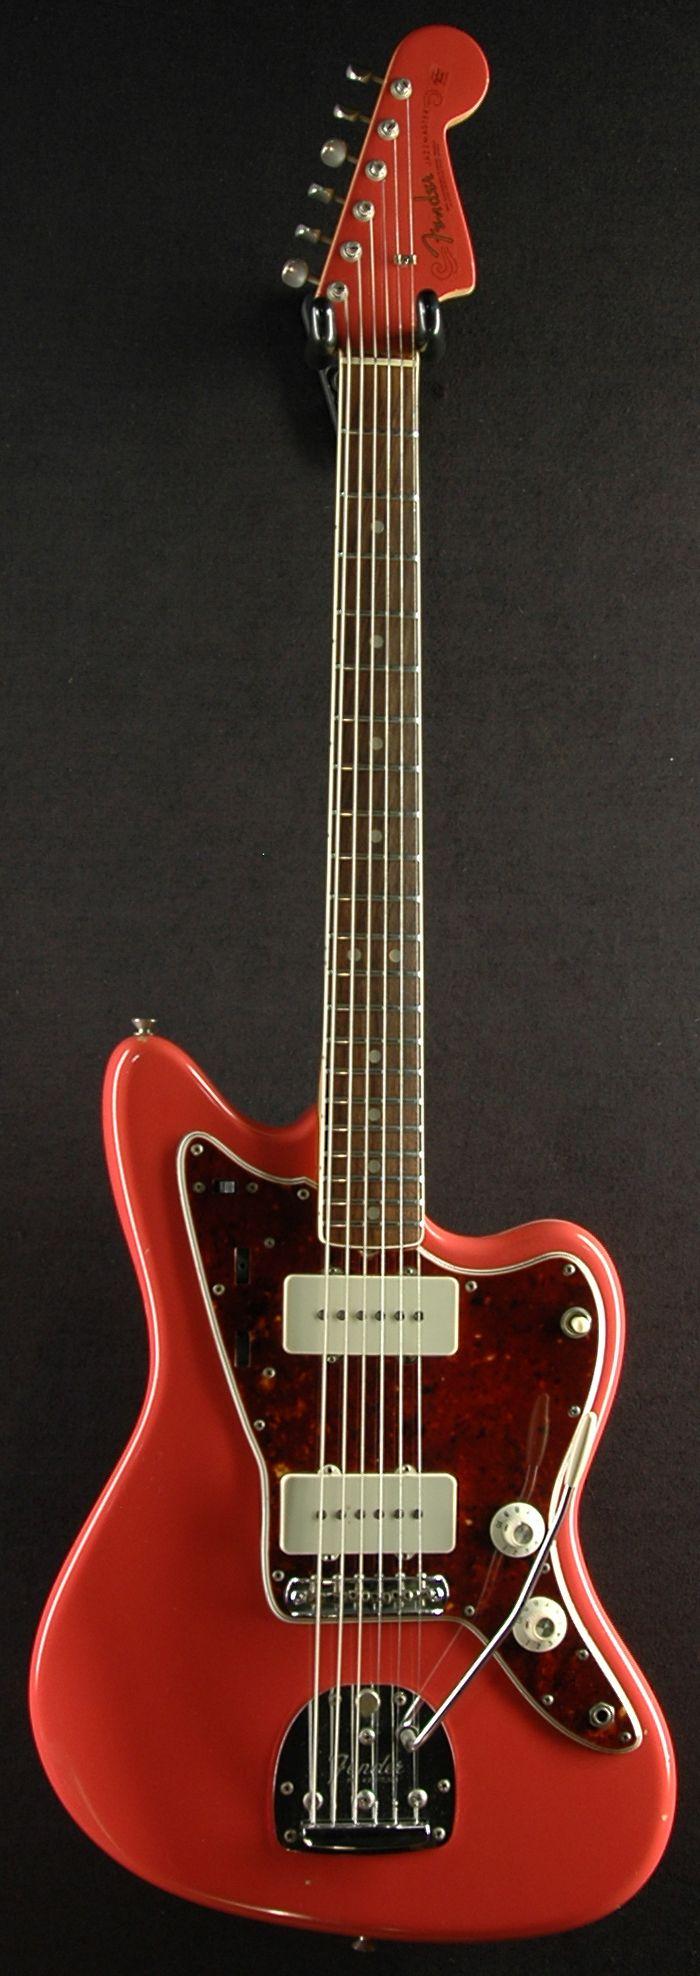 1965 Fender Jazzmaster. I'm starting to really like the ...